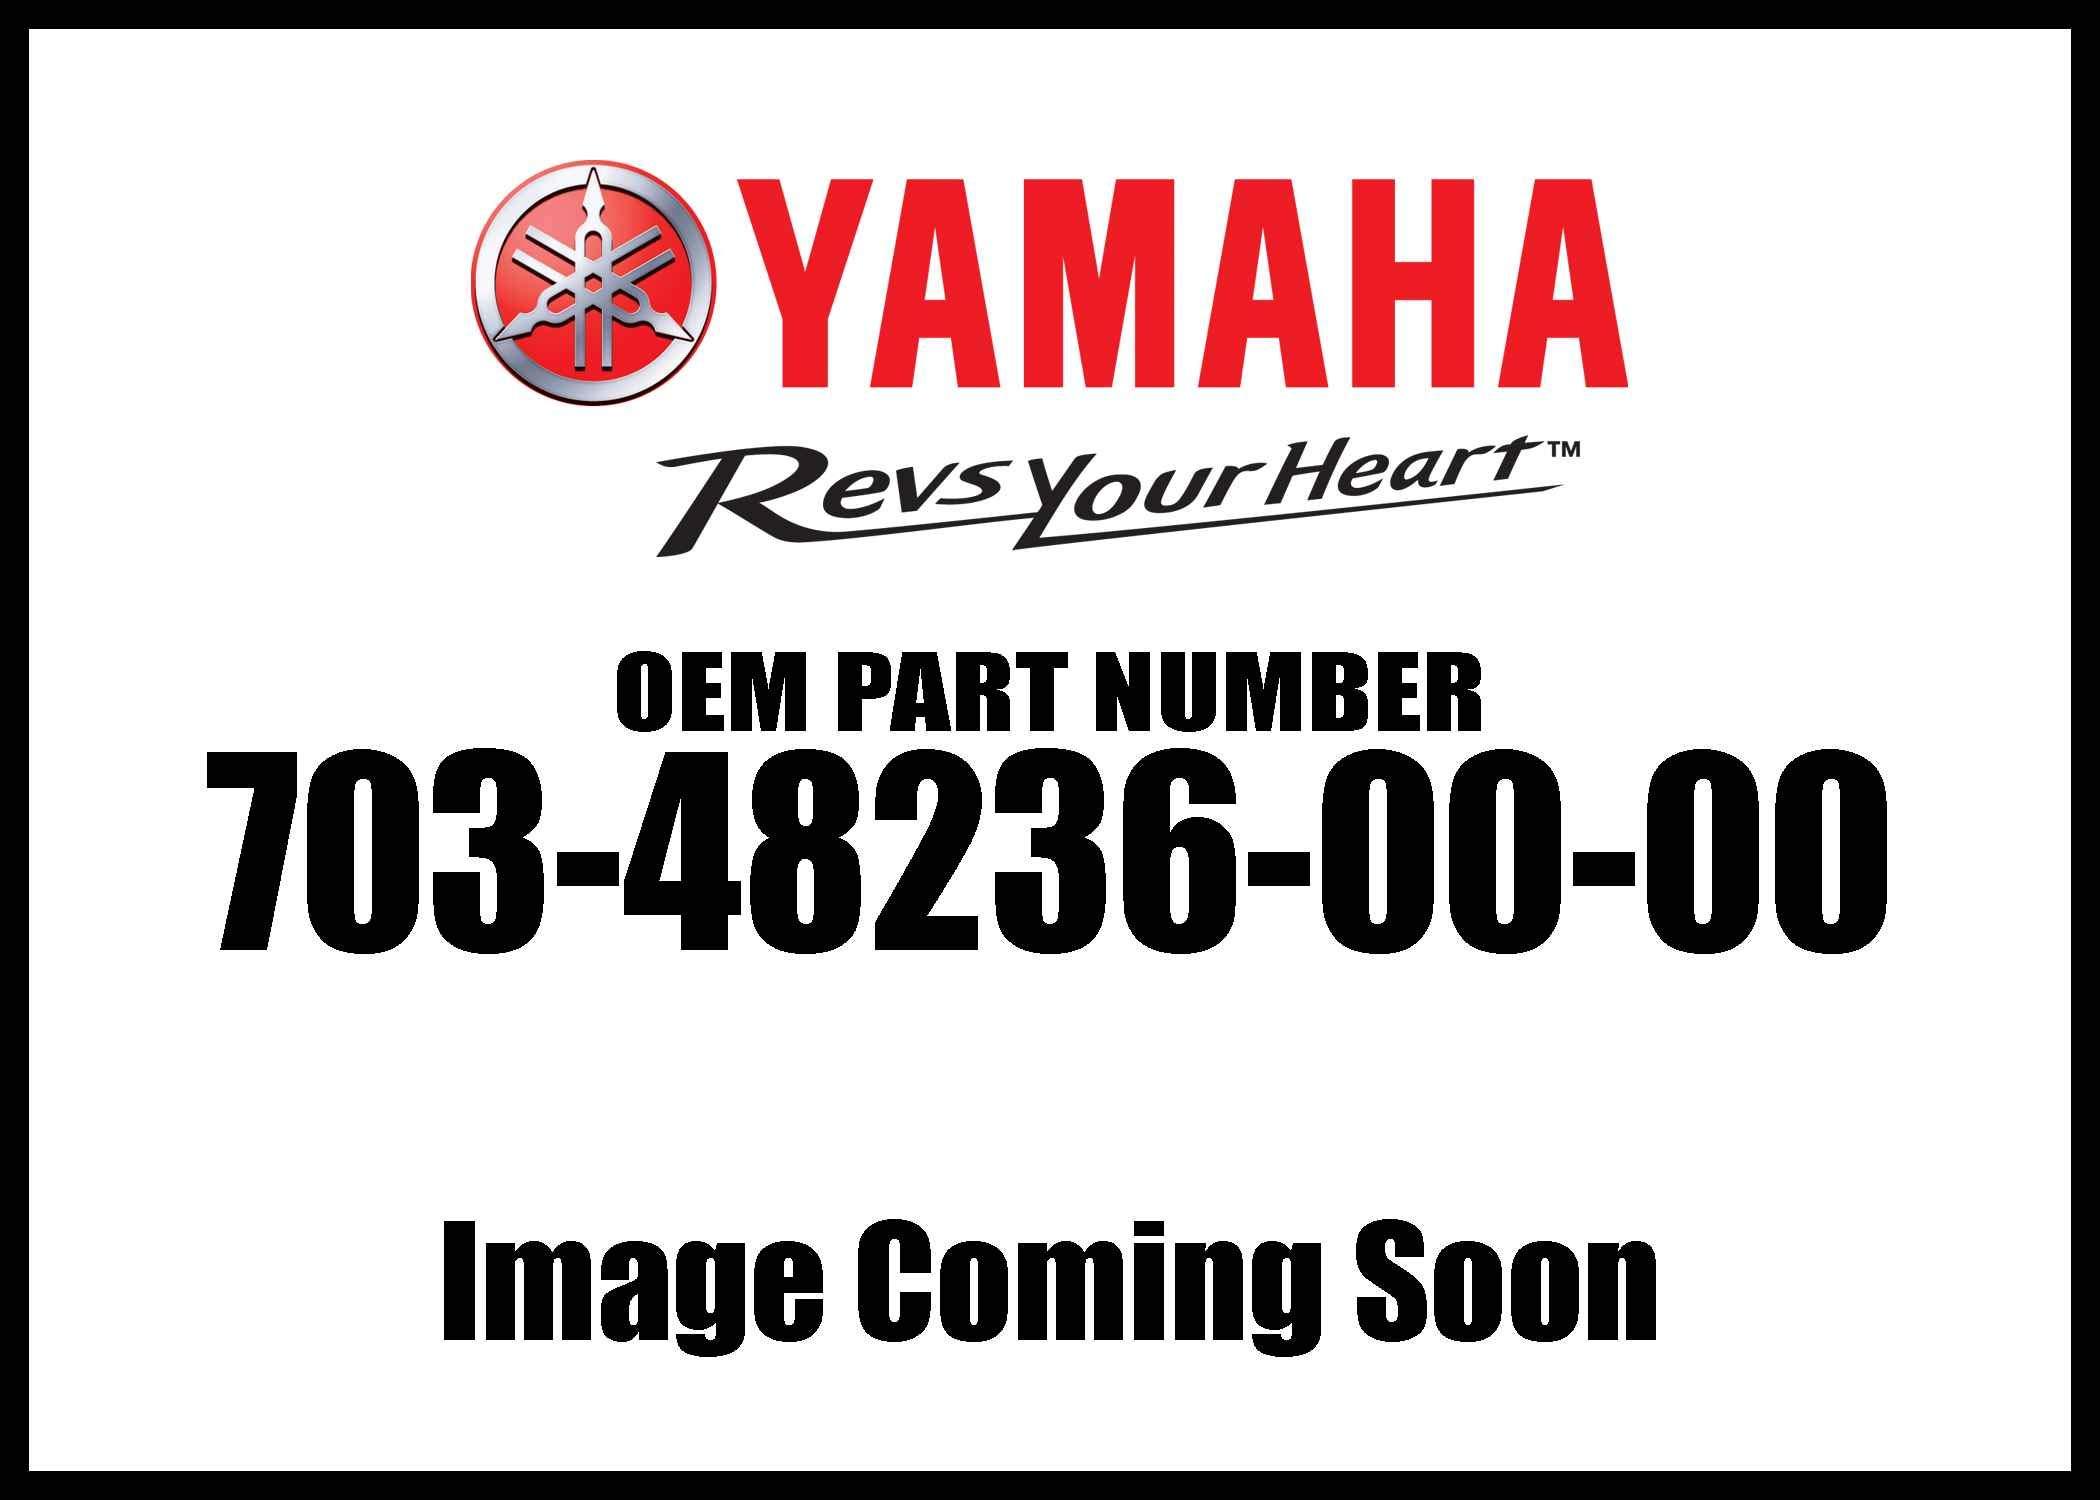 Yamaha Genuine Motors New Bushing Part # 703-48236-00